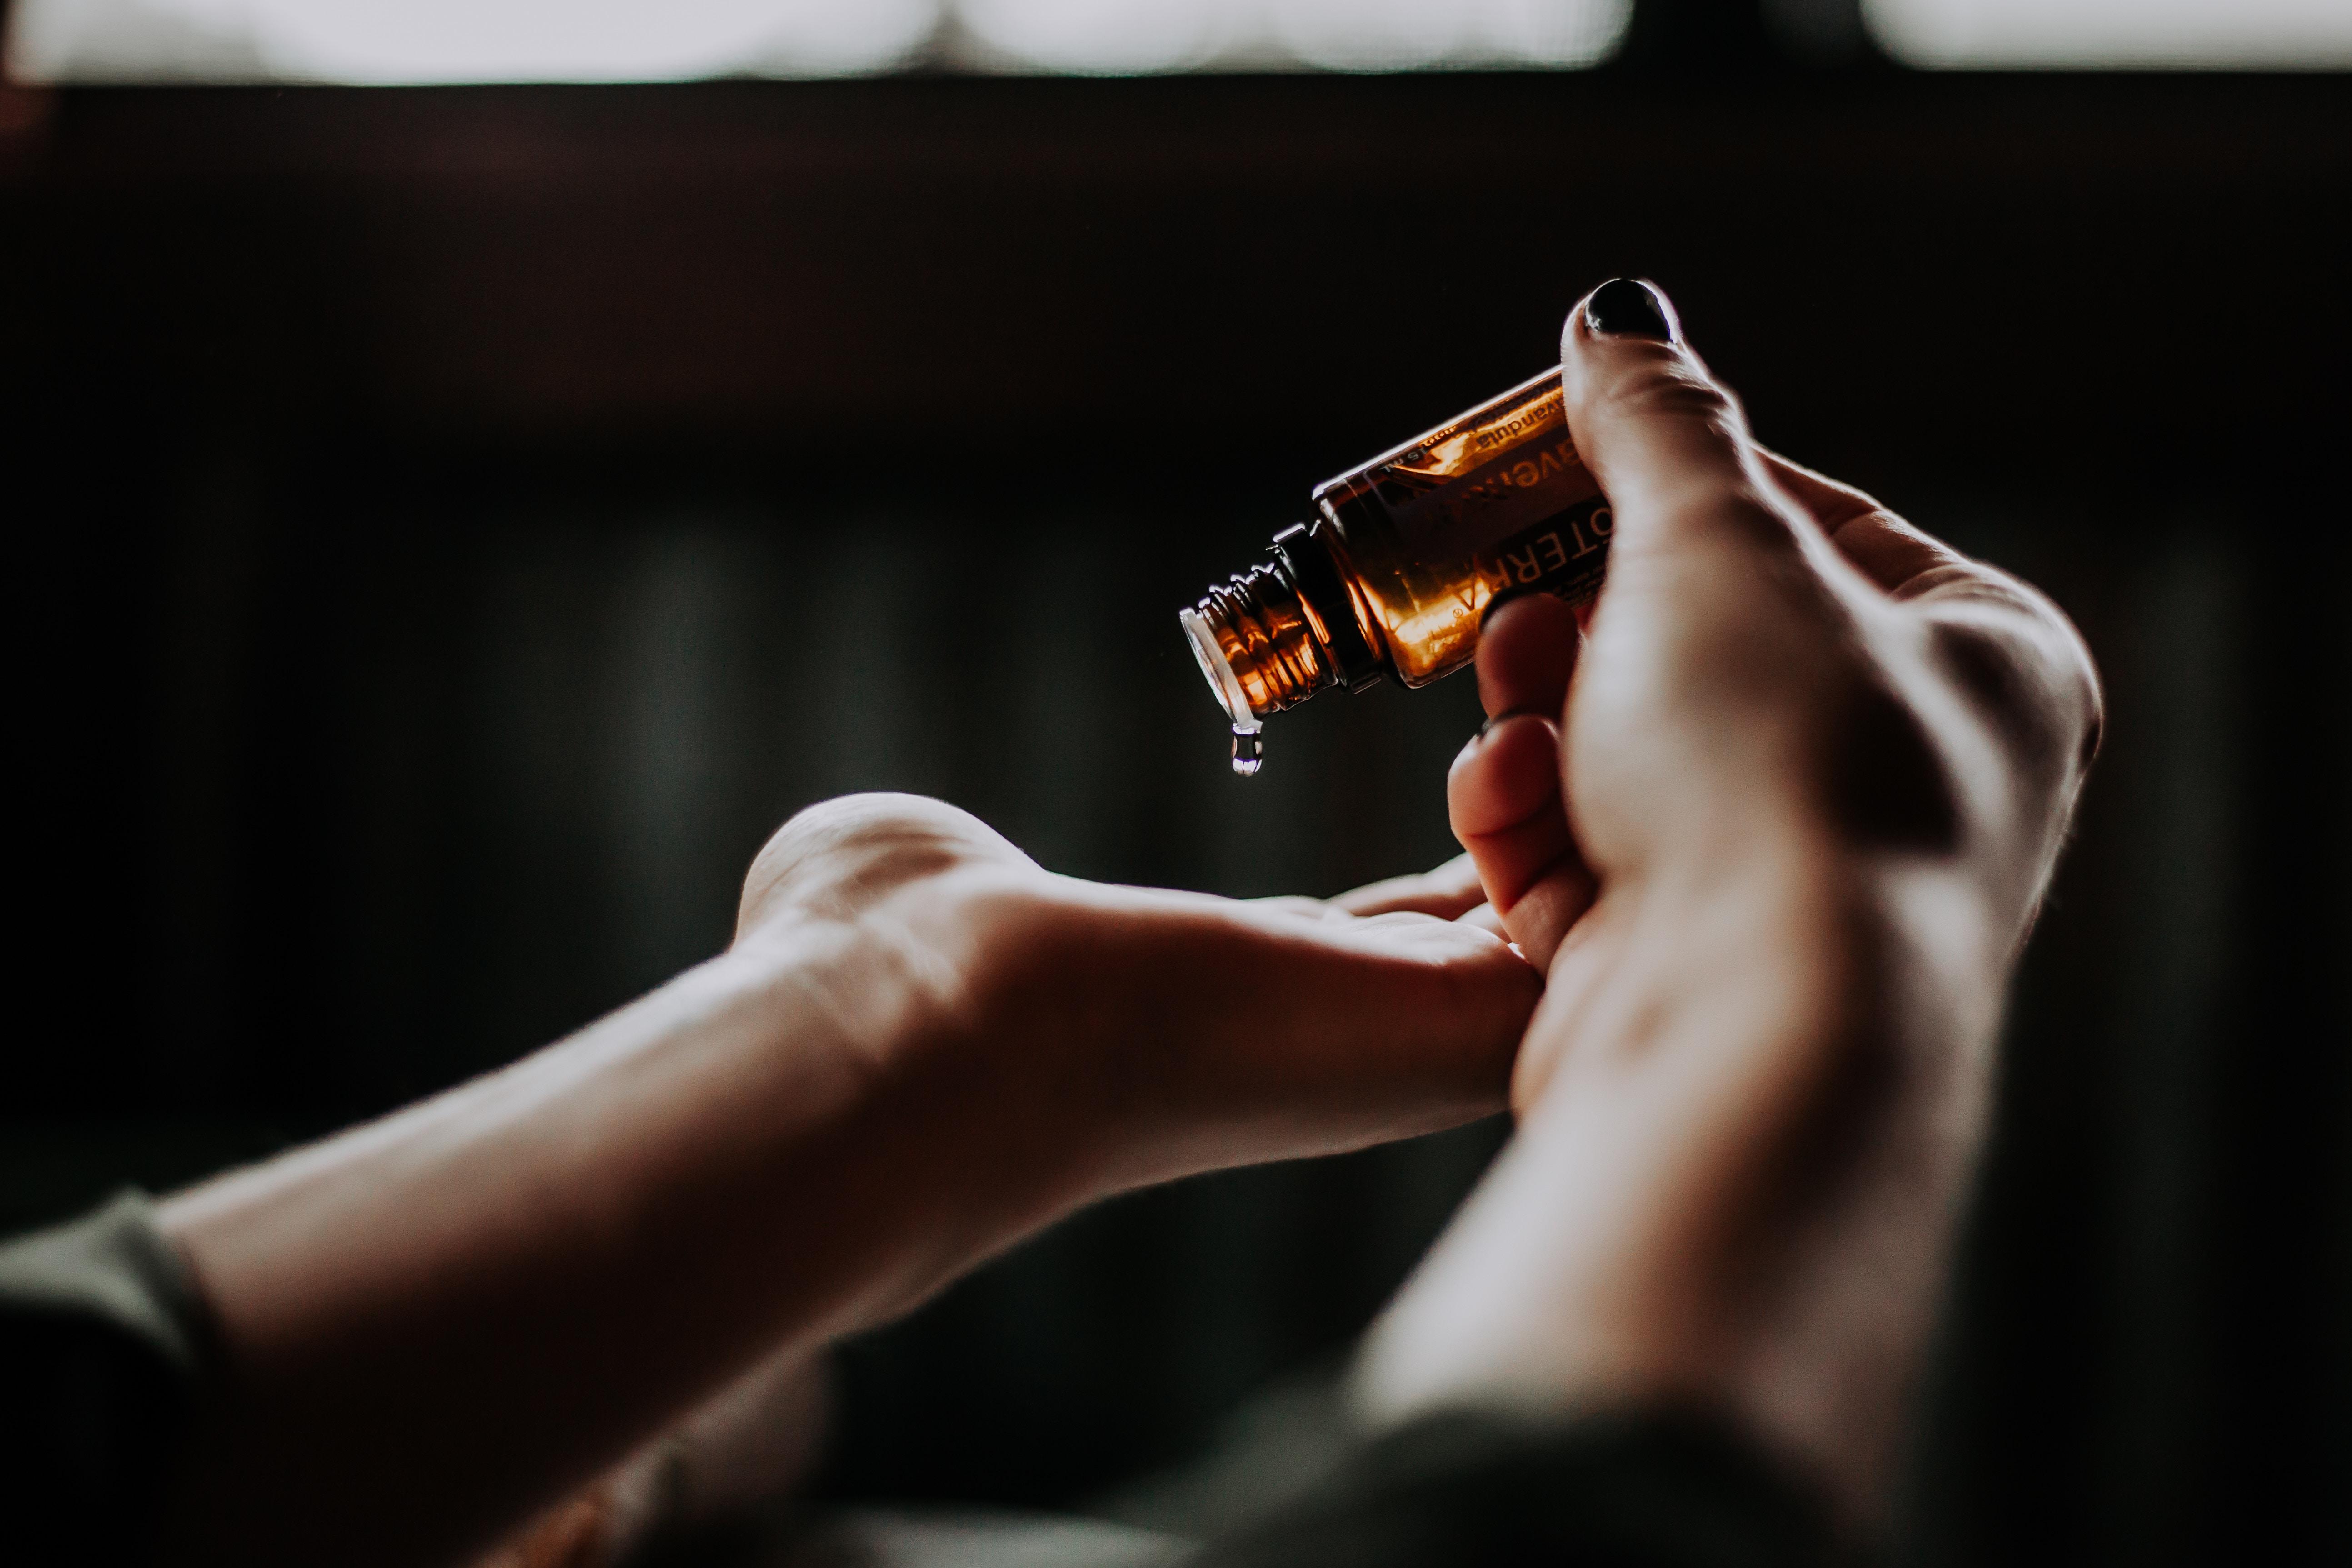 romance_oil_massage_unsplash